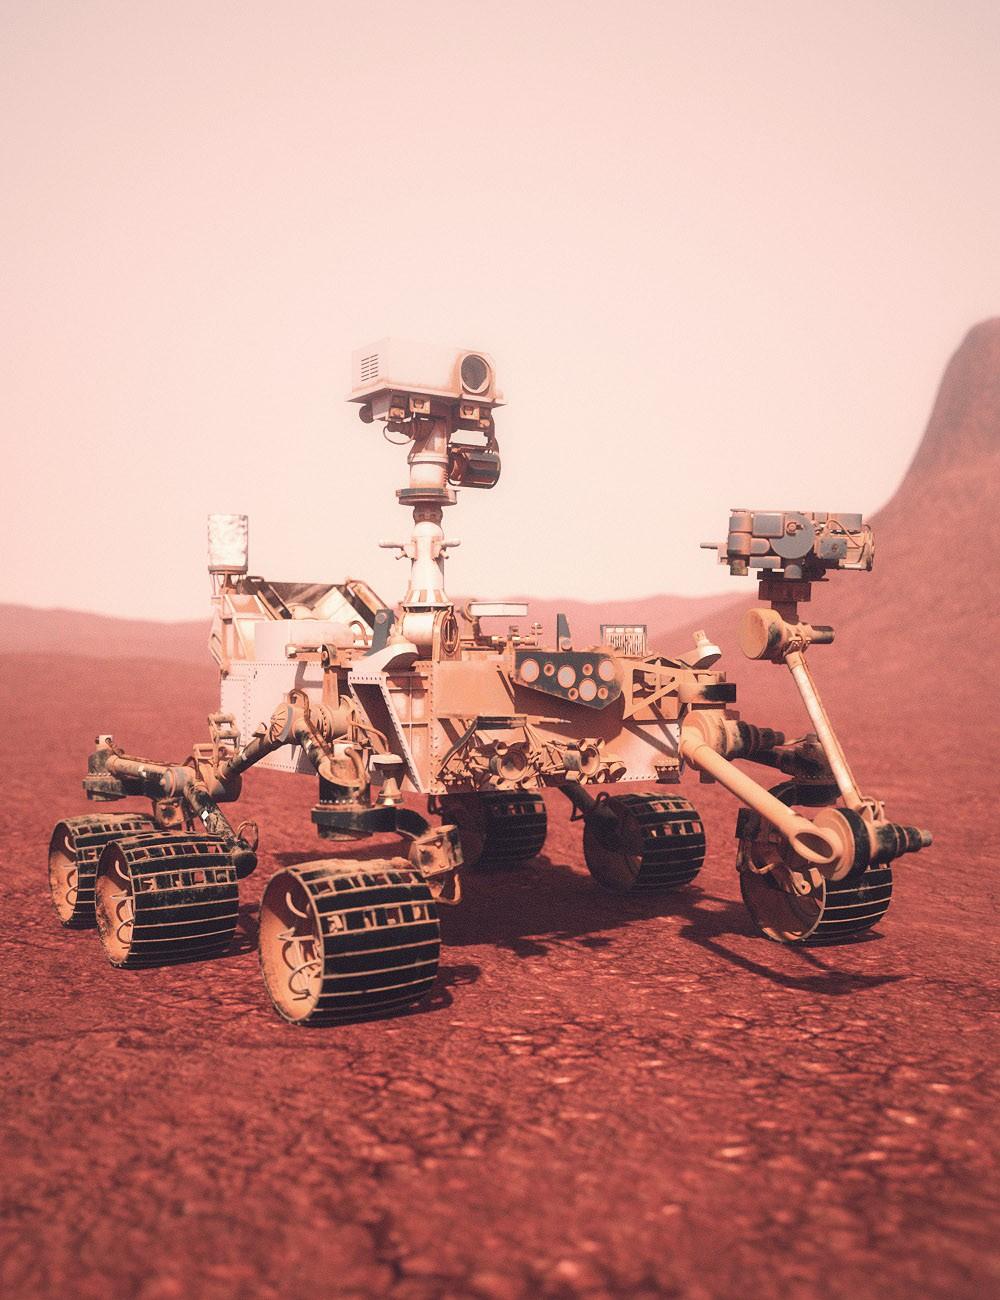 Download DAZ Studio 3 for FREE DAZ 3D Mars Rover